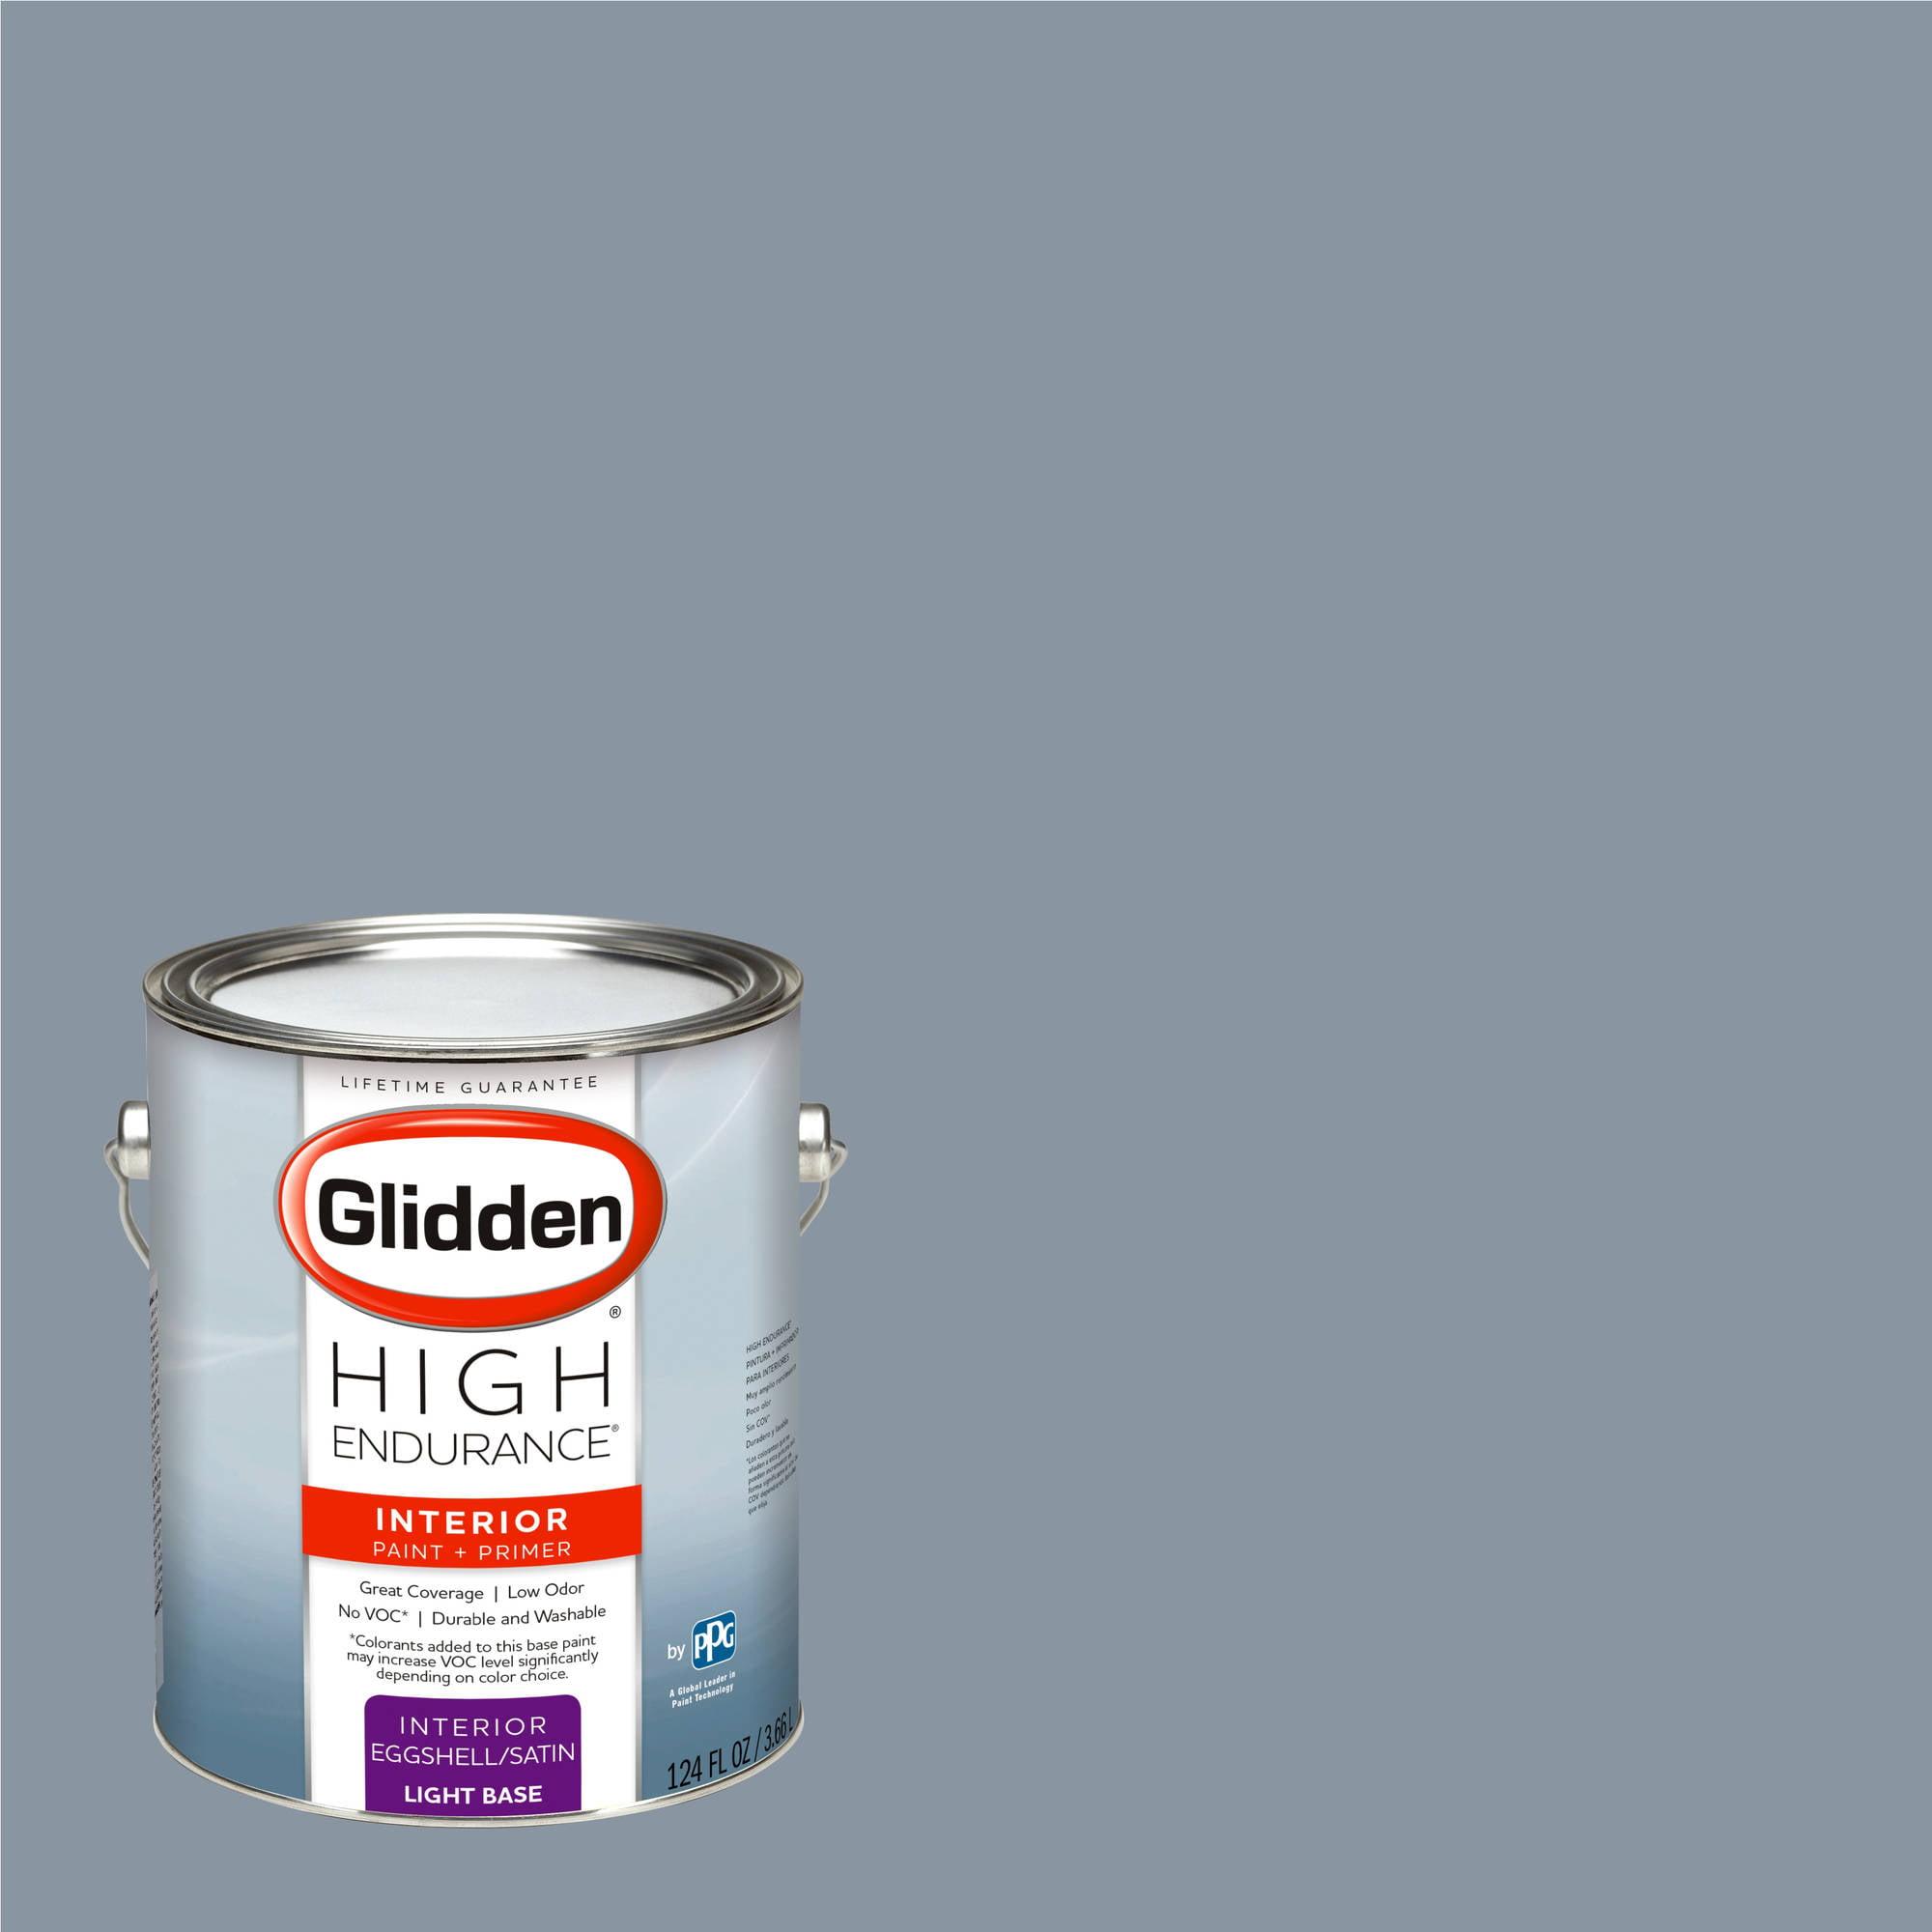 Glidden Smoky Charcoal glidden high endurance, interior paint and primer, smoke